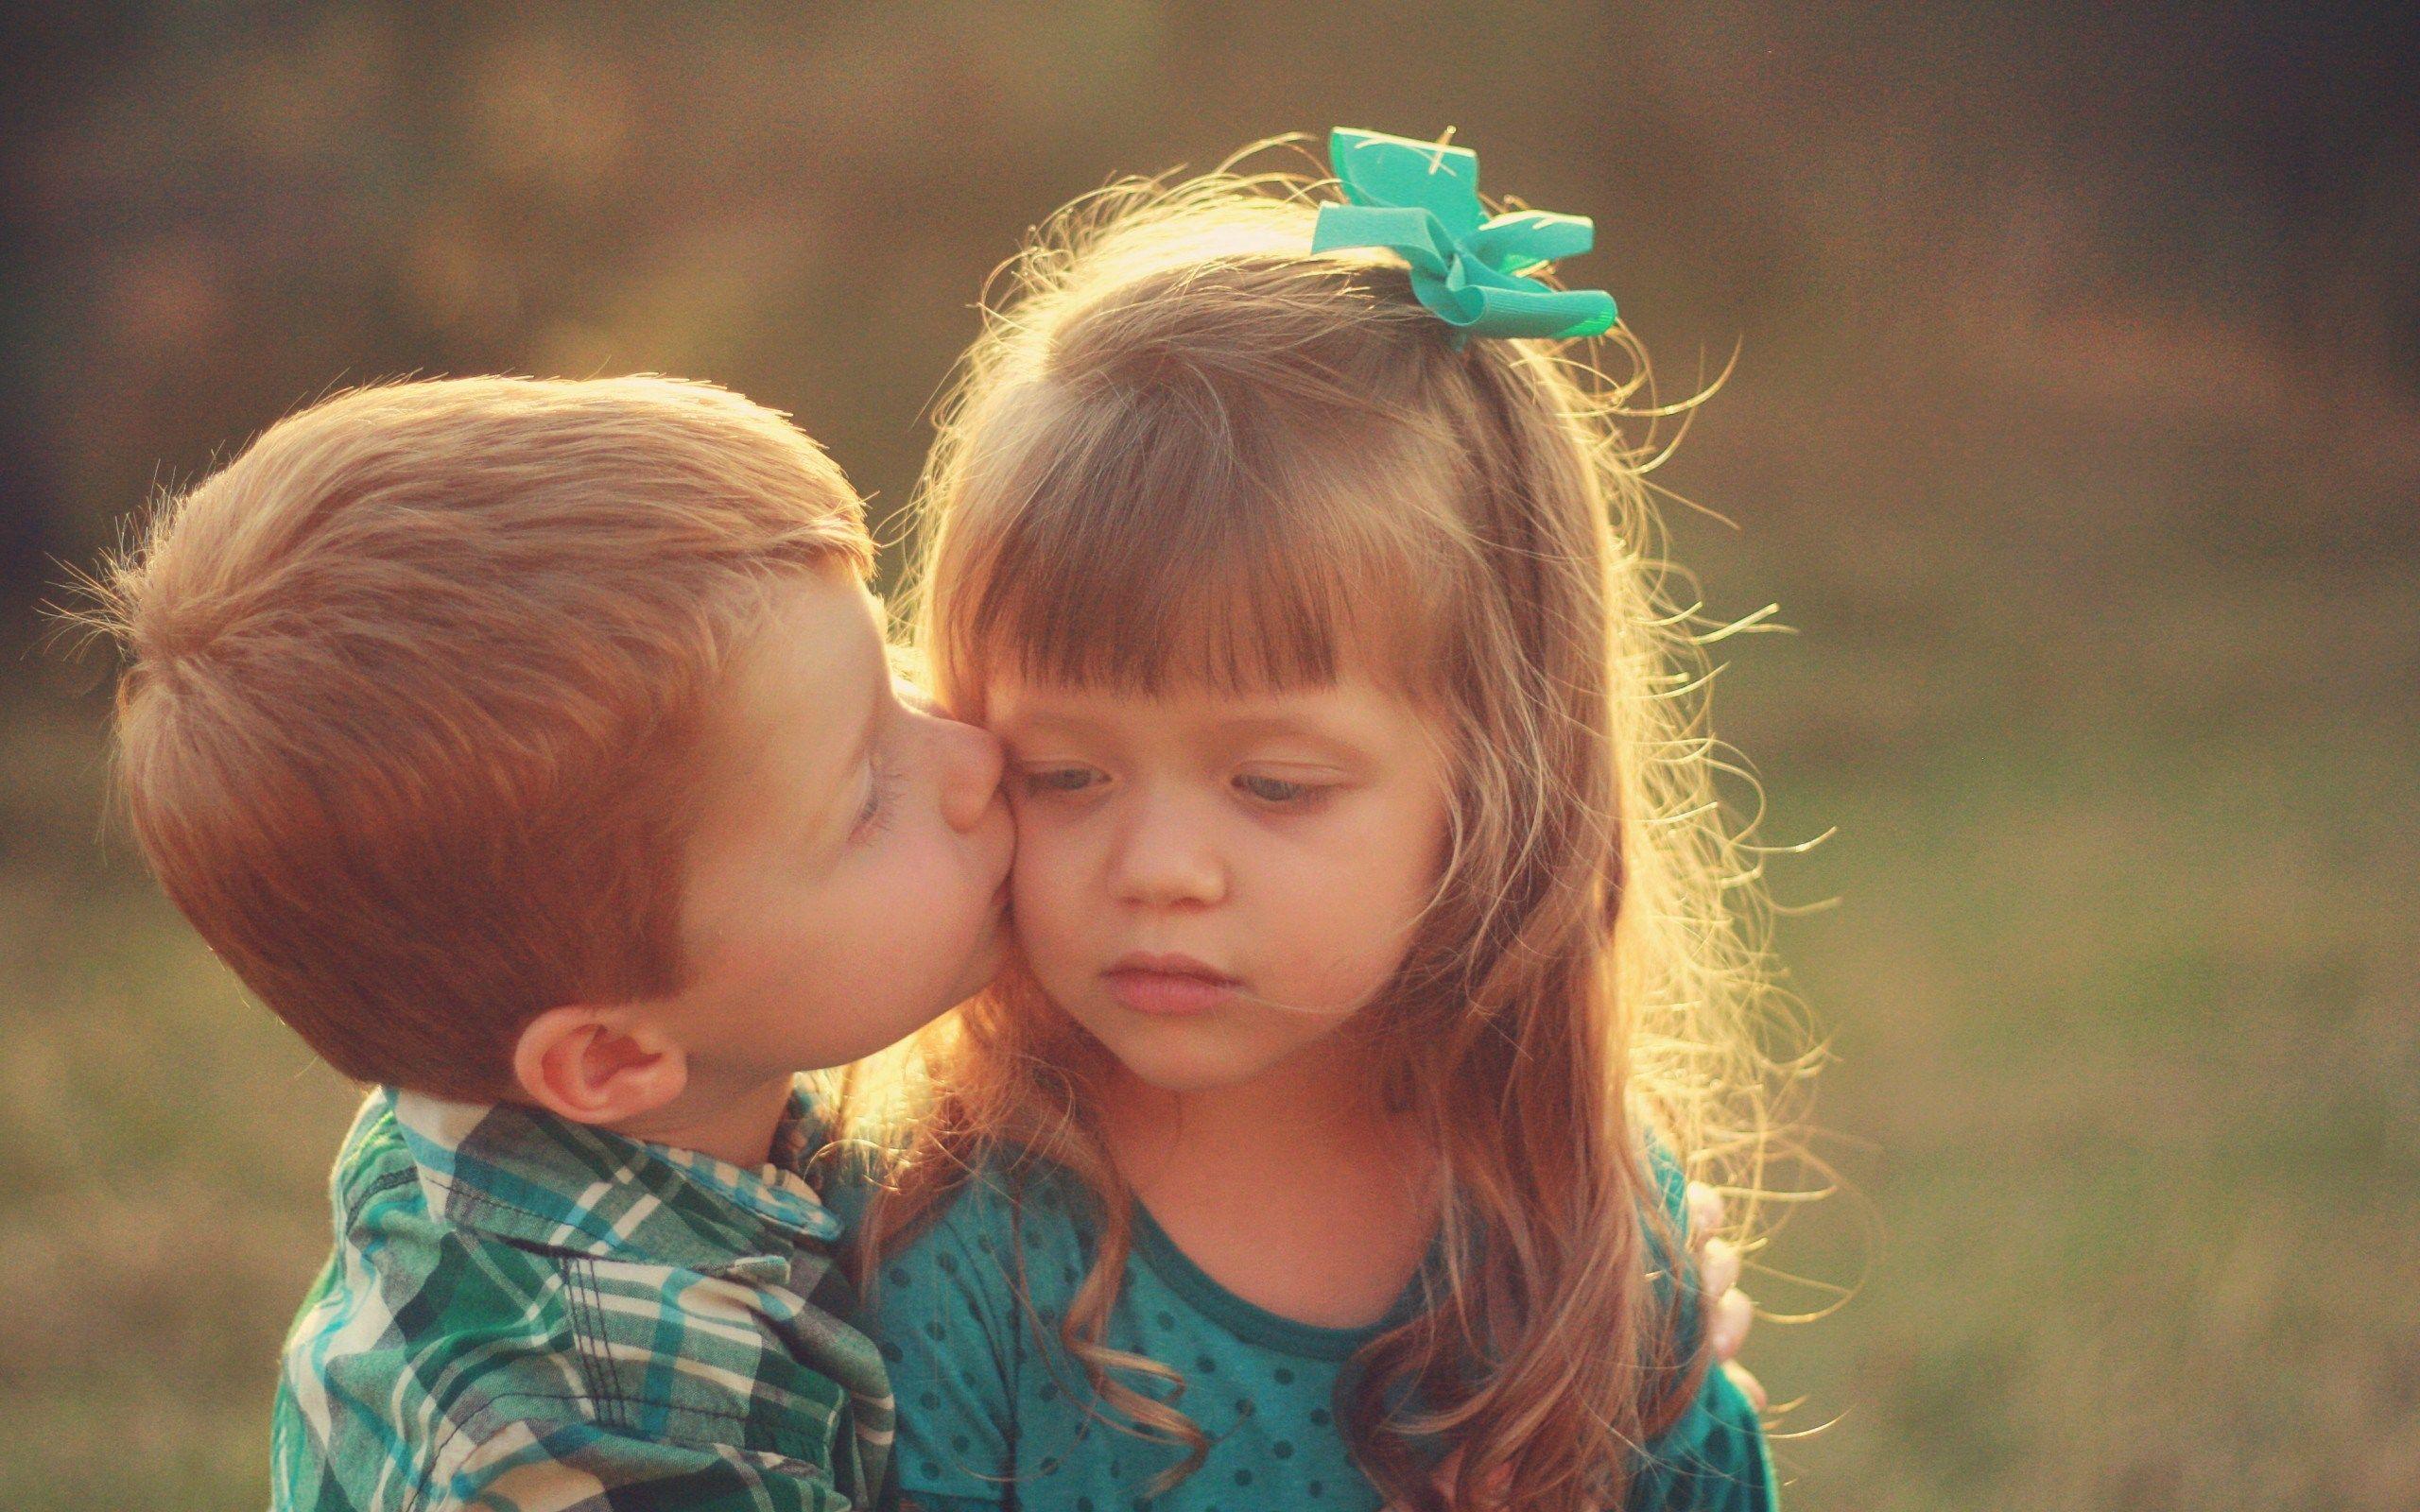 boy girl kiss wallpaper - sf wallpaper